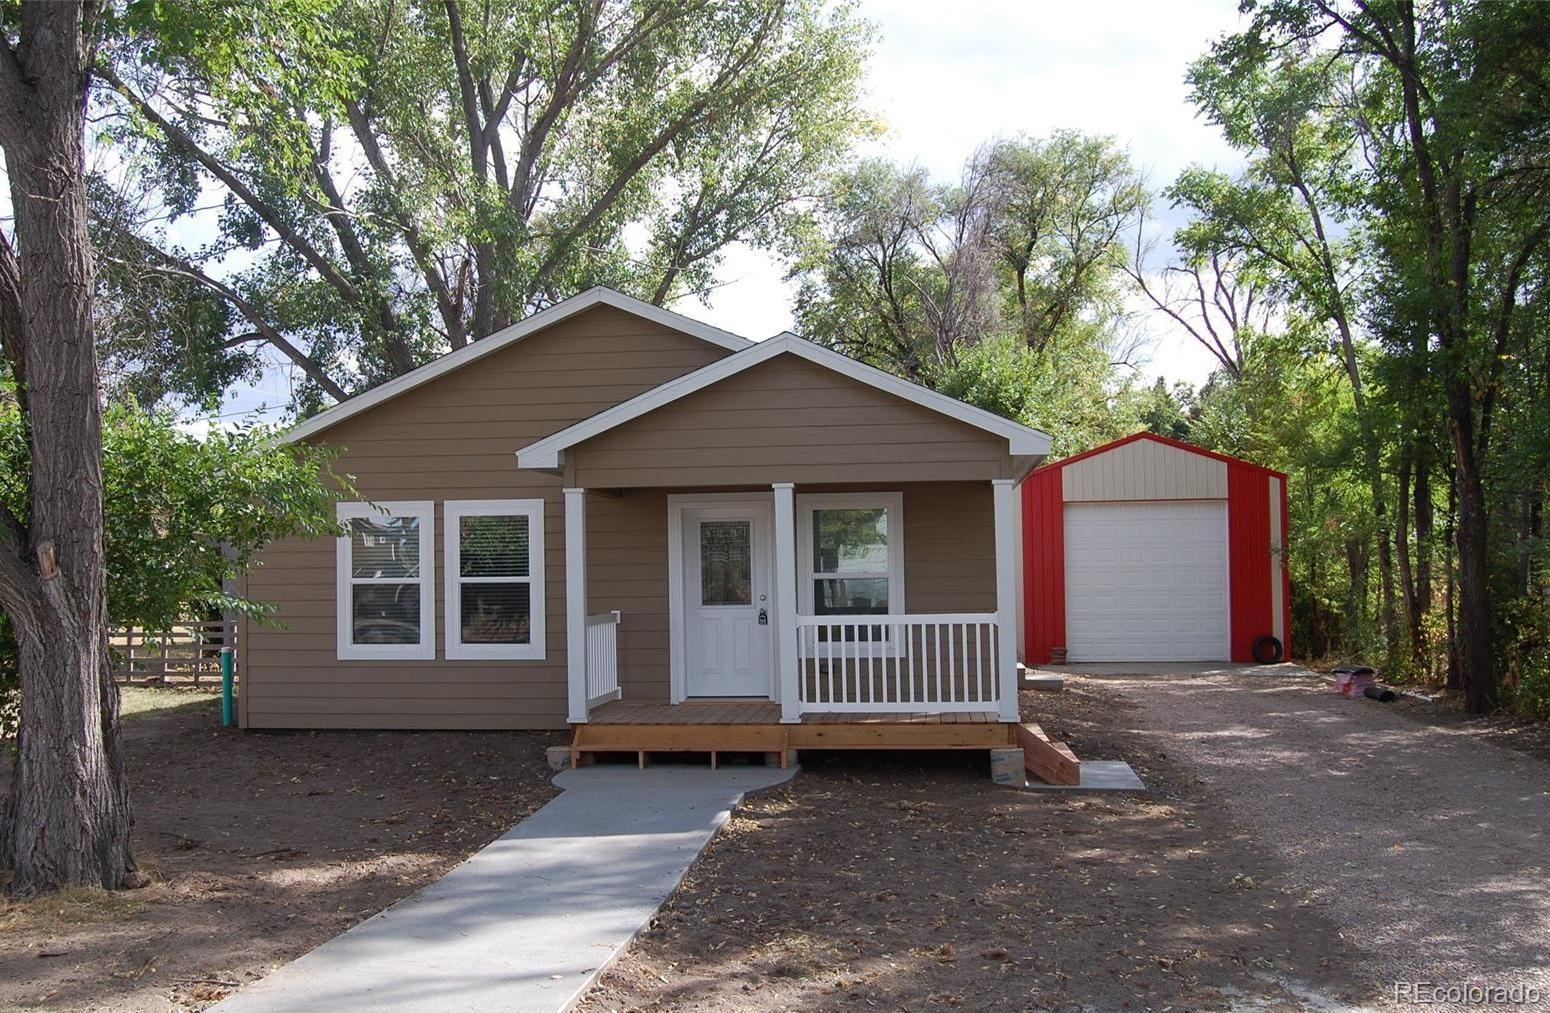 MLS# 9171580 - 1 - 426 Cheyenne Street, Kiowa, CO 80117